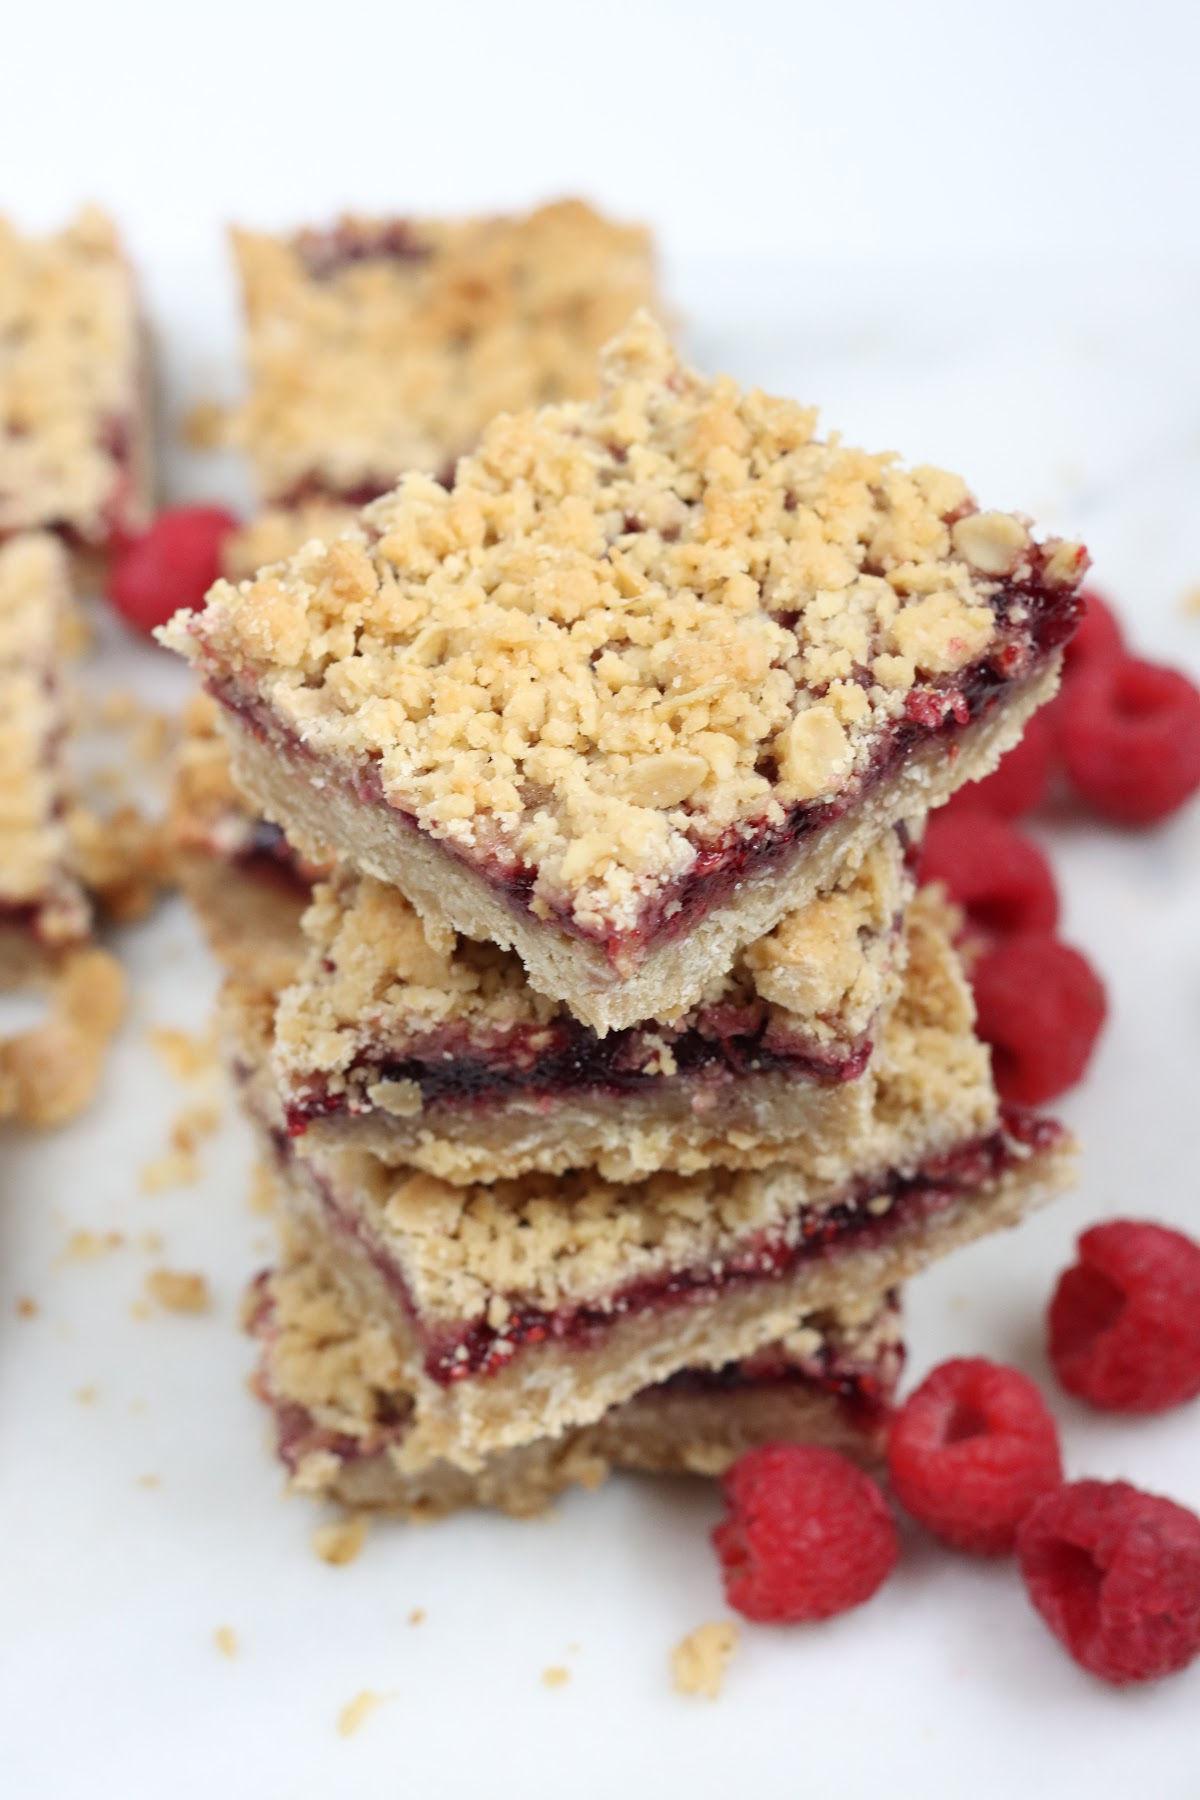 raspberry bars stacked on each other, fresh raspberries around the bottom.